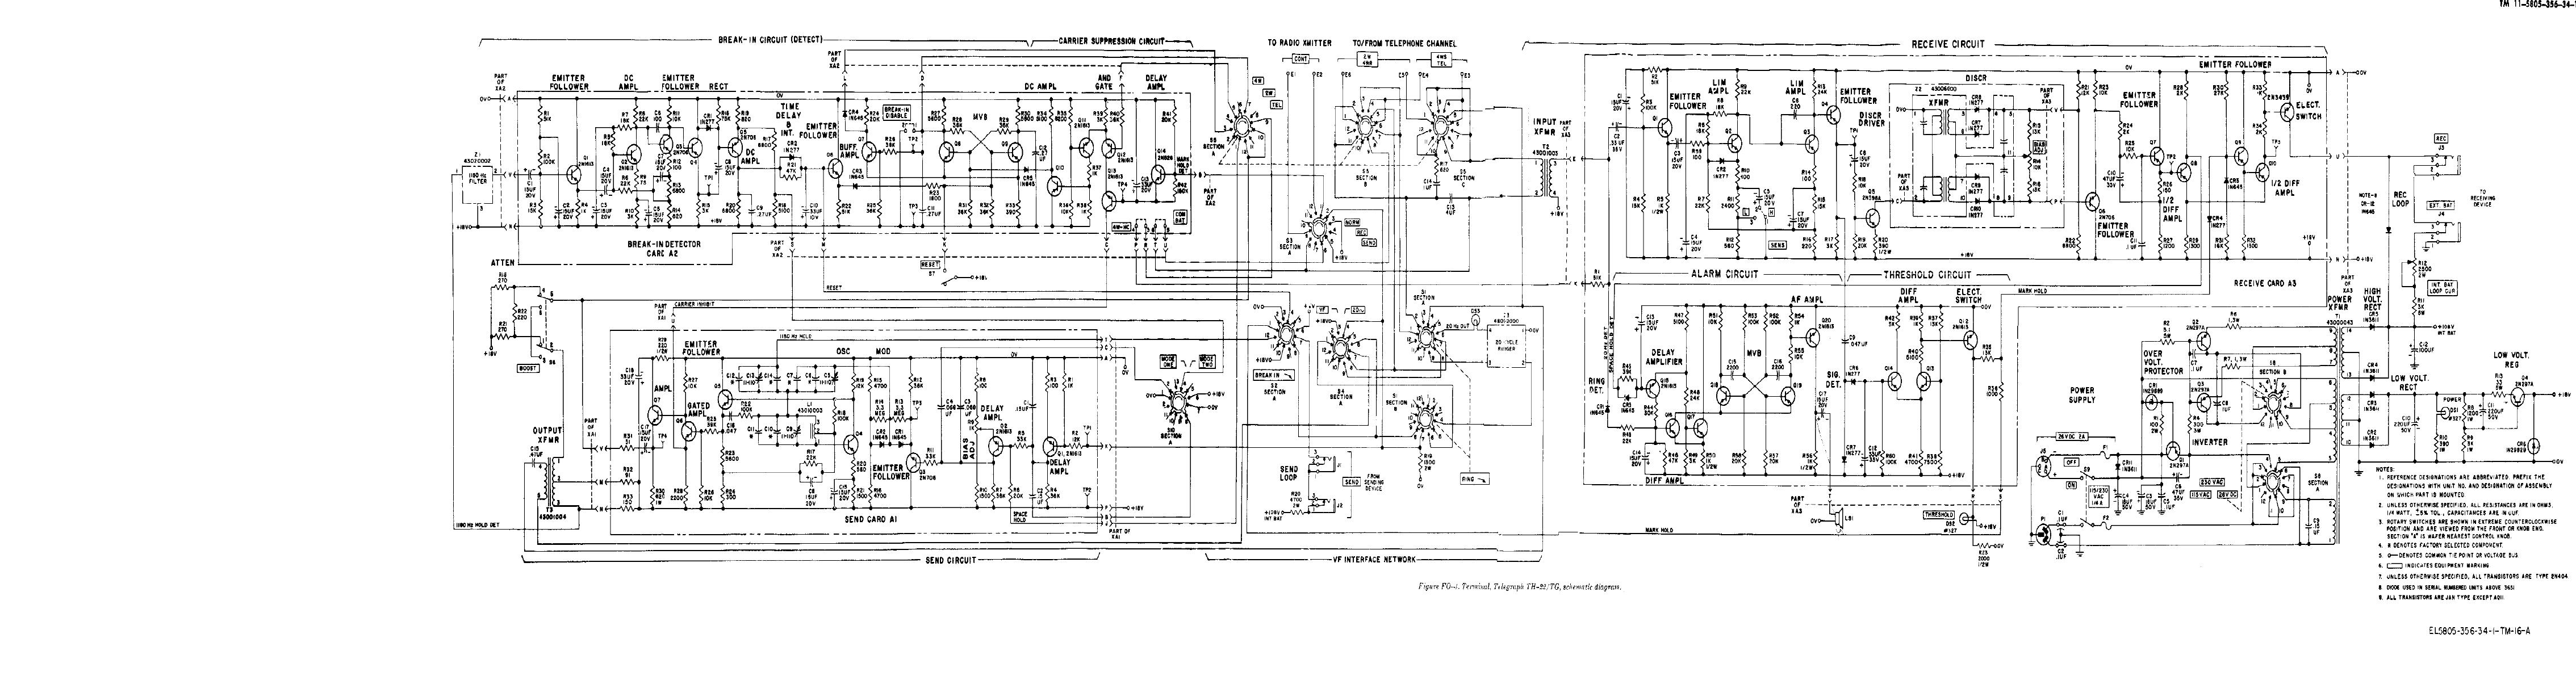 figure fo tg  schematic diagram